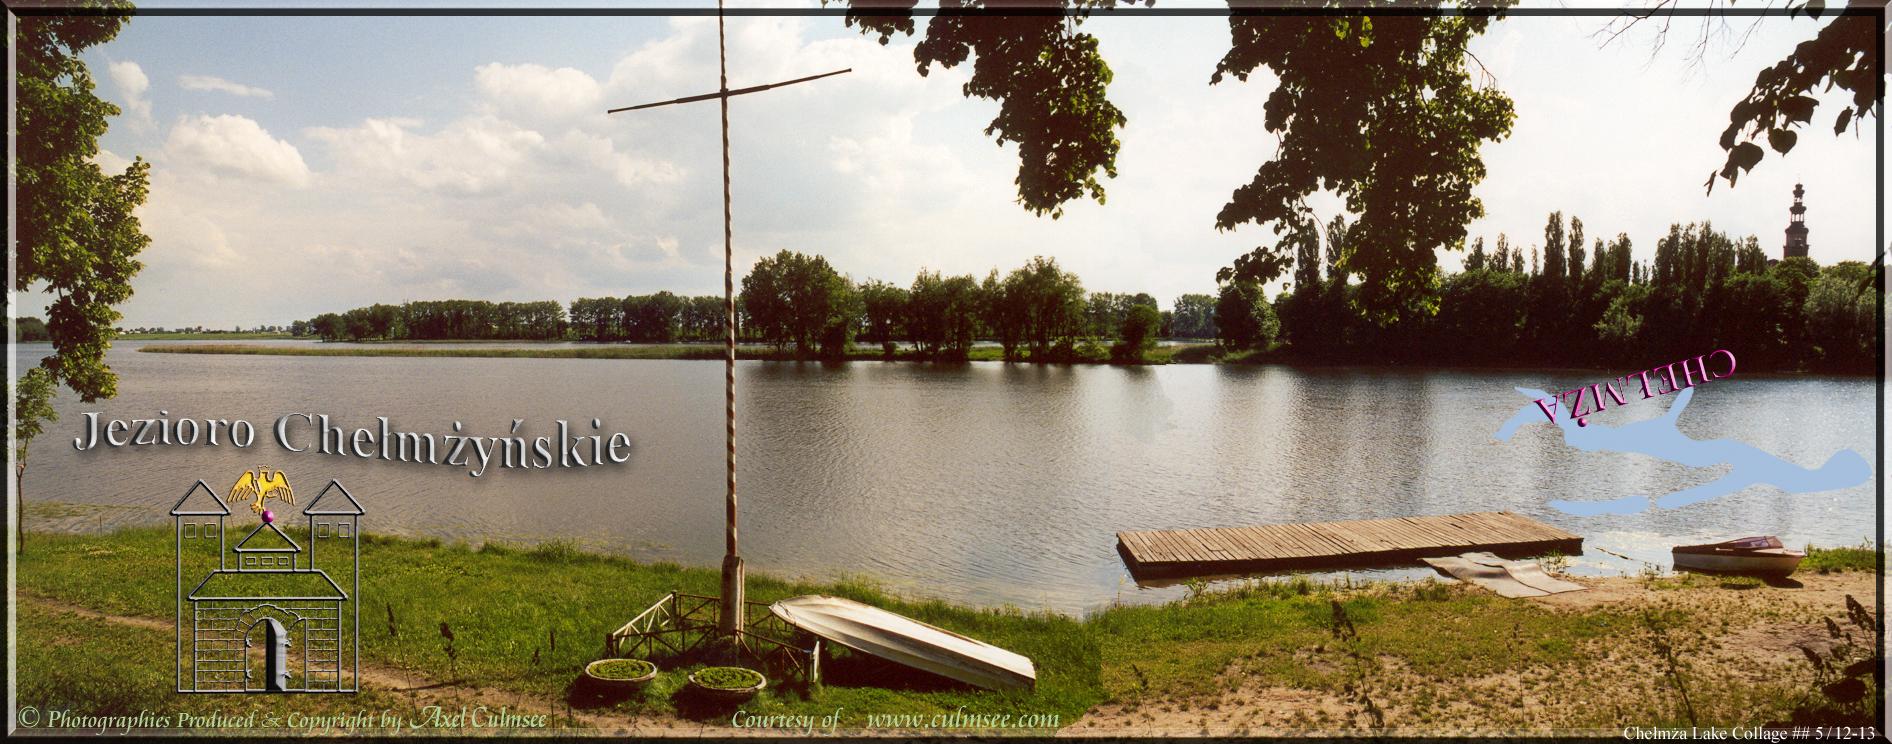 Chelmza Jezioro Chelmzynskie 2001